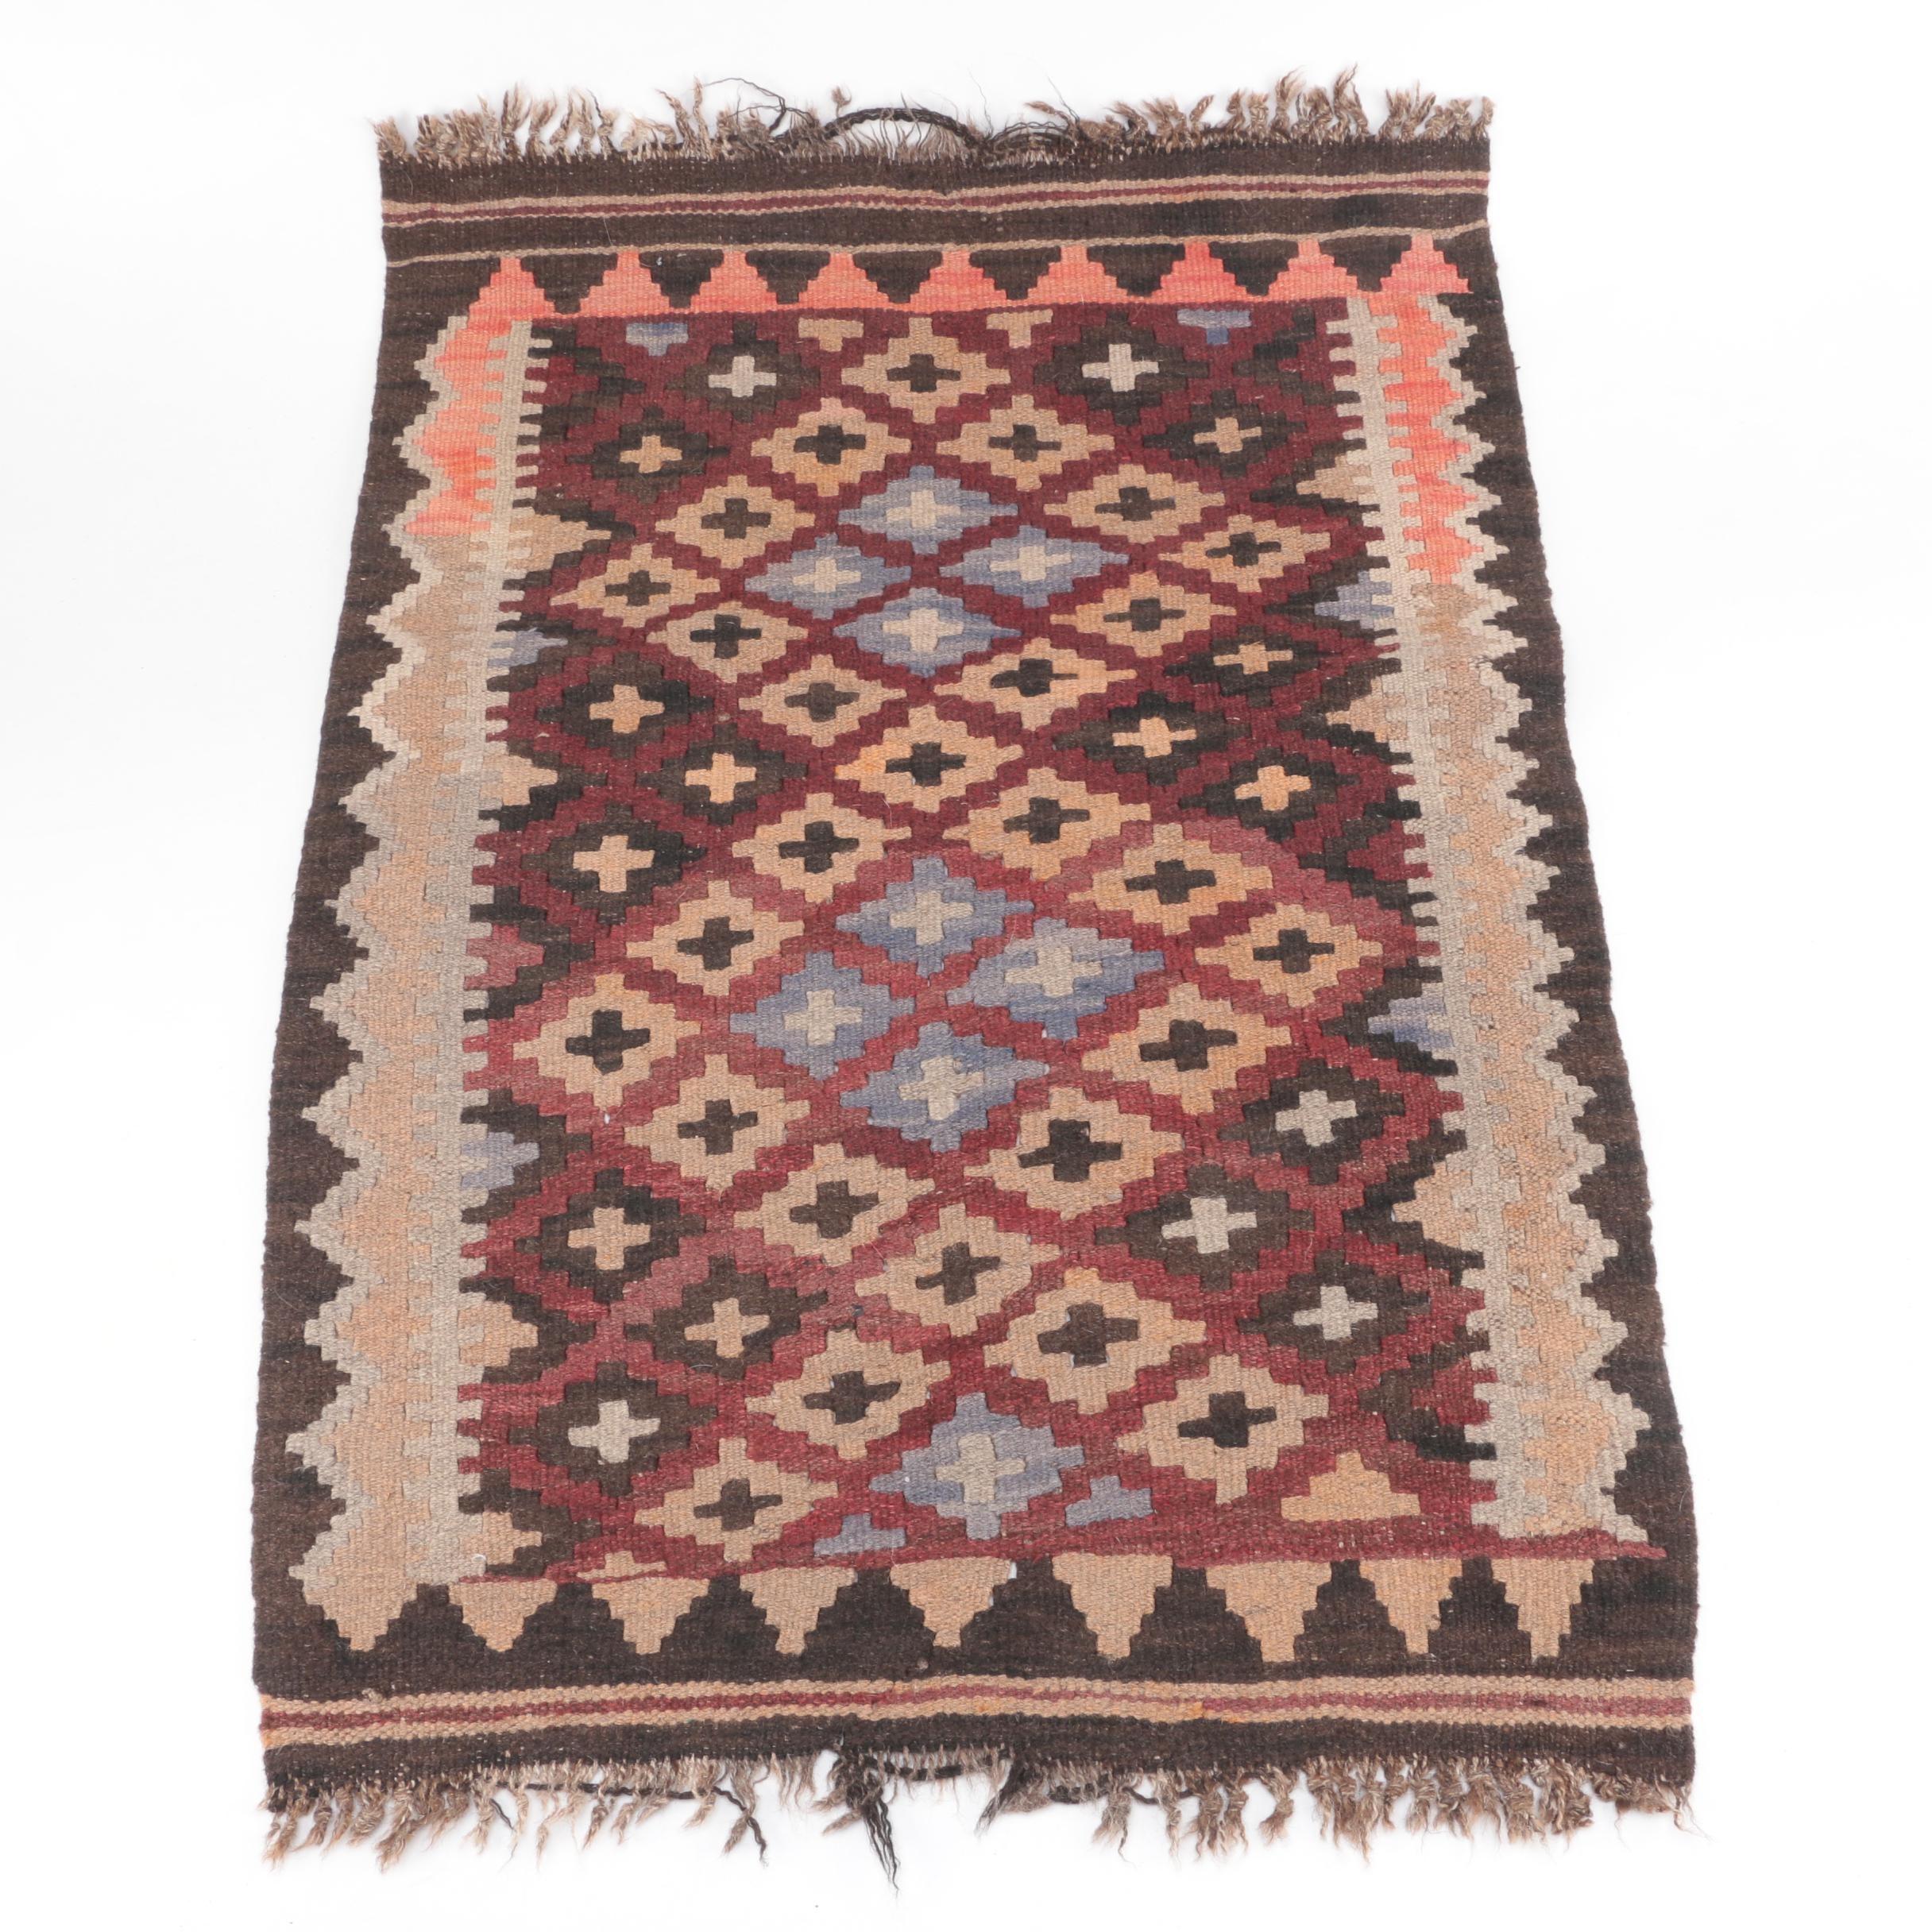 Handwoven Anatolian Wool Accent Kilim